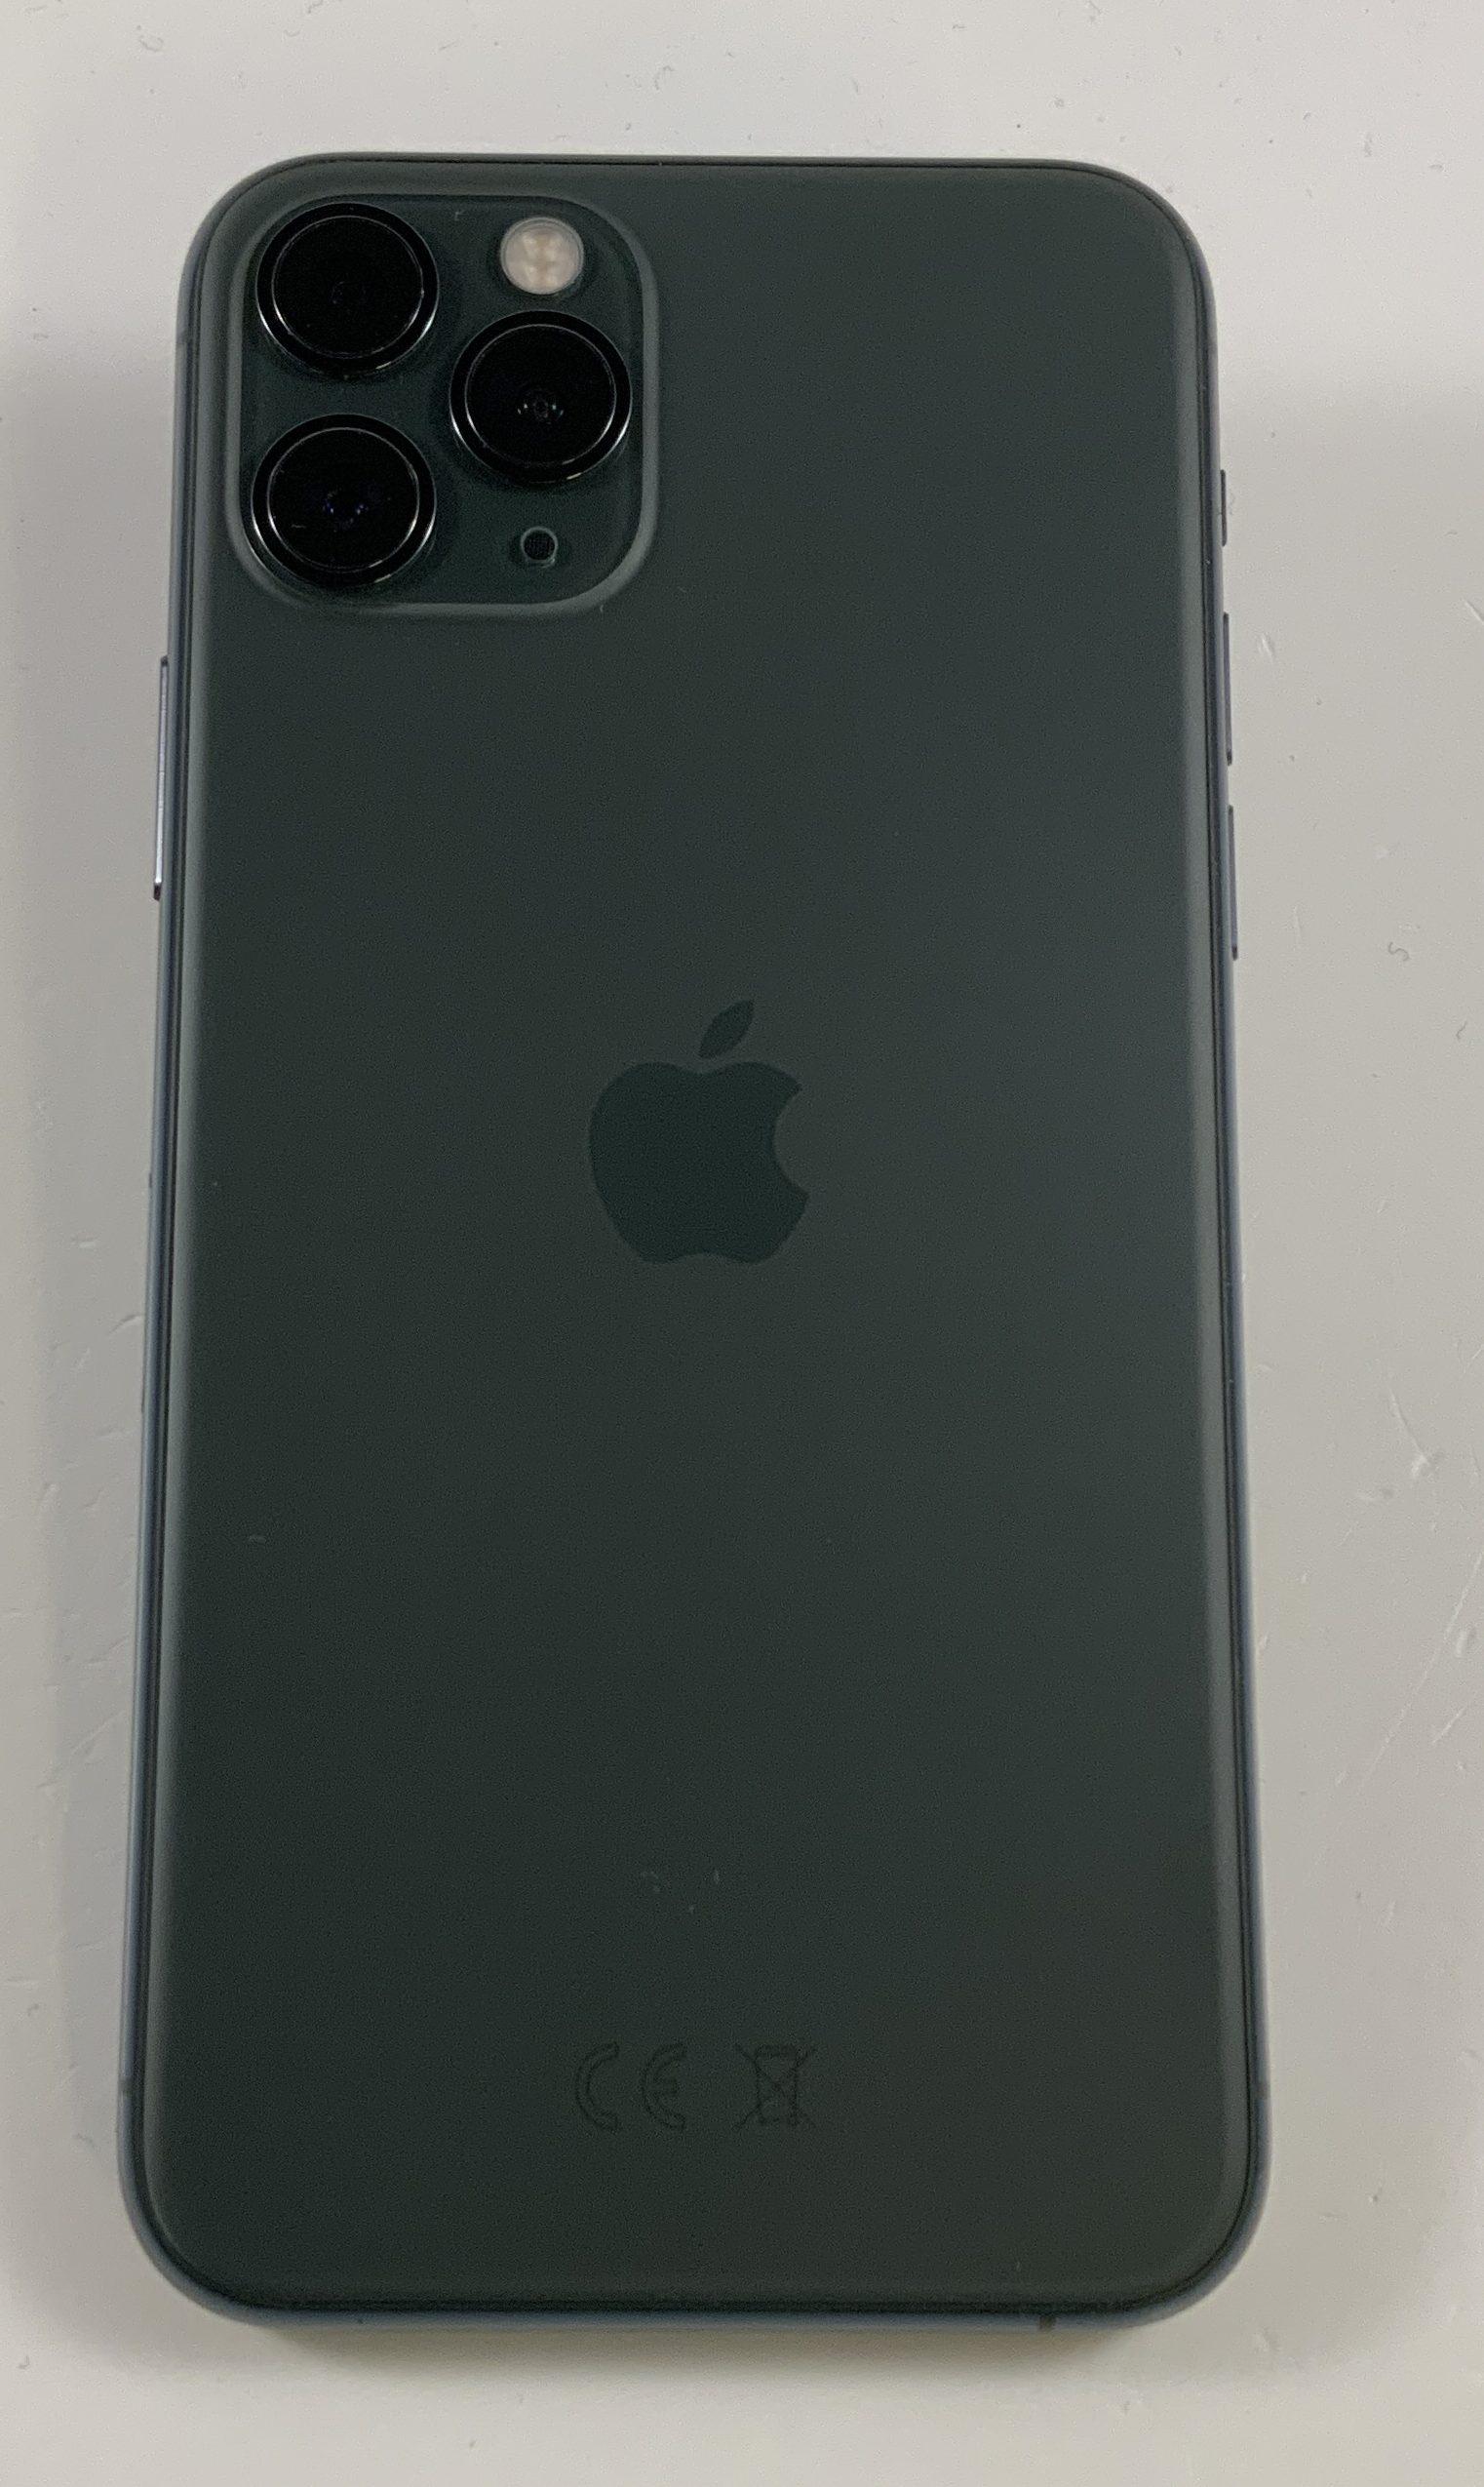 iPhone 11 Pro 64GB, 64GB, Midnight Green, image 2